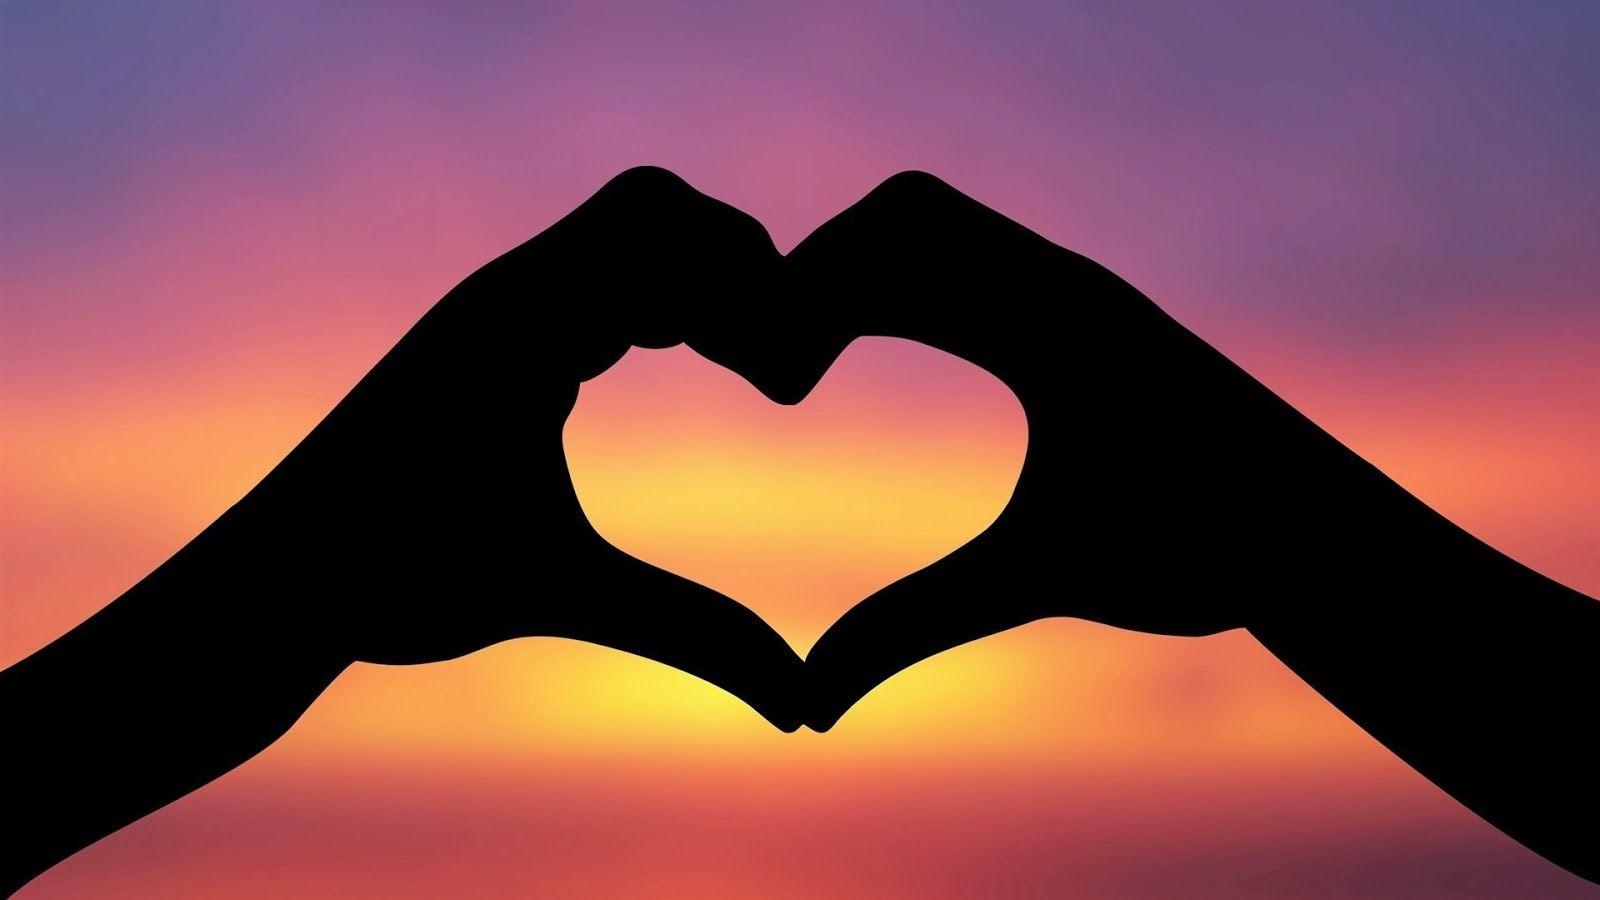 Cute Love Desktop Wallpapers Top Free Cute Love Desktop